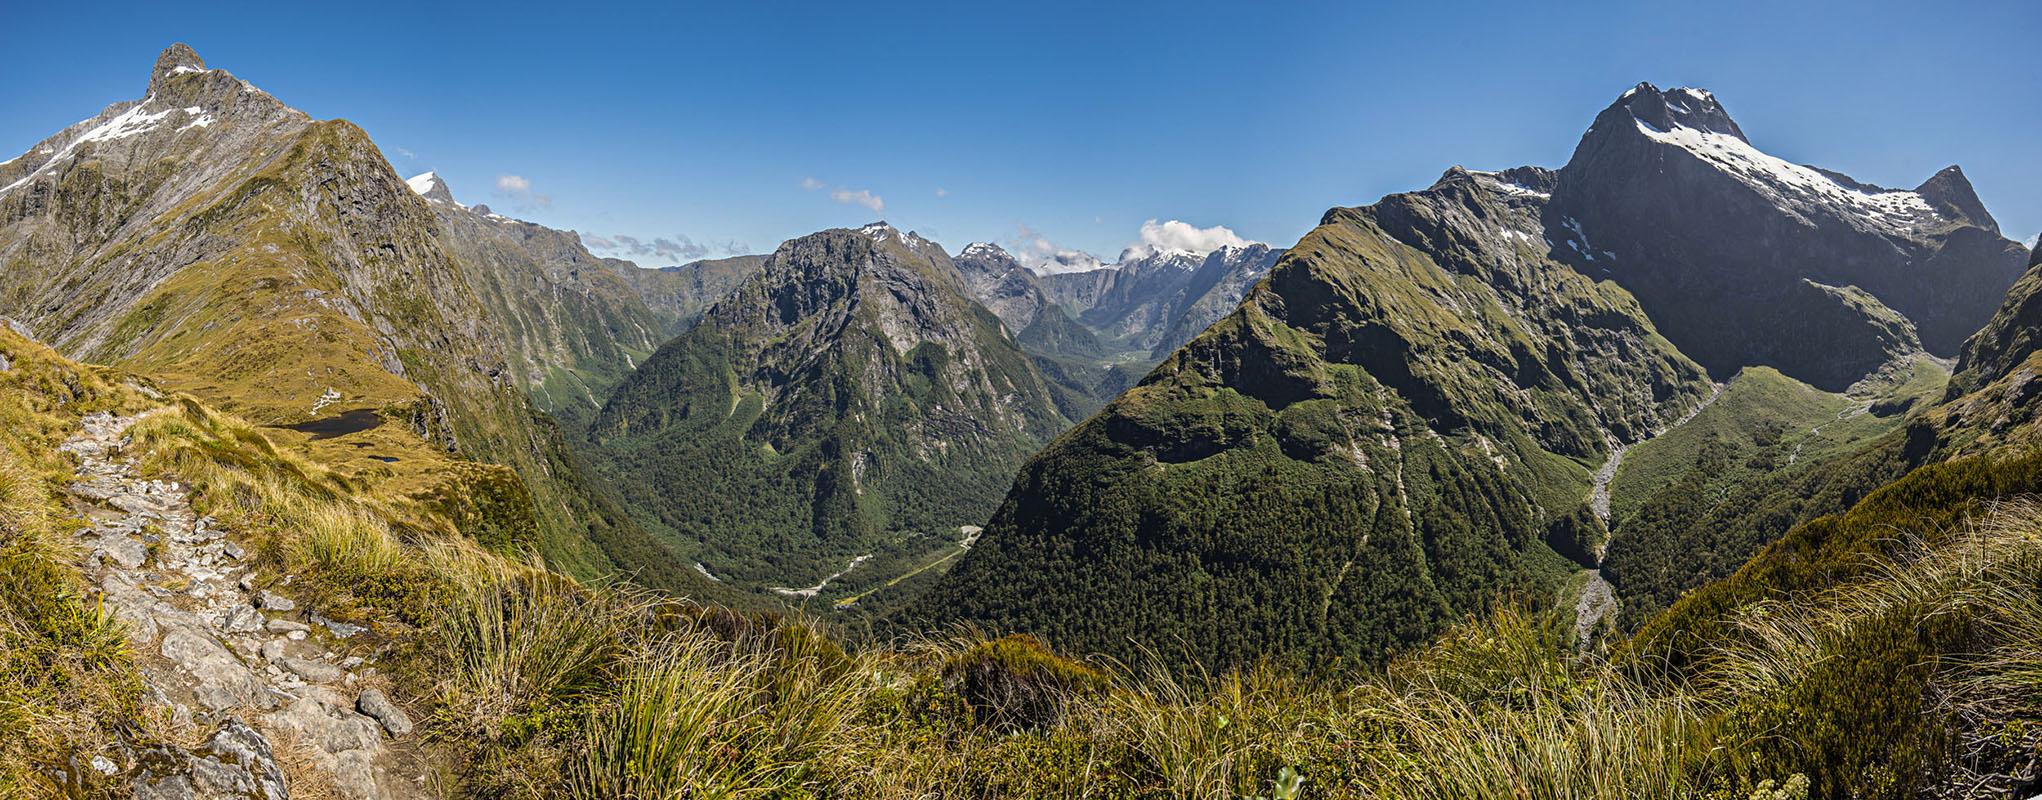 Randonnées parc national Fiordland - Milford track